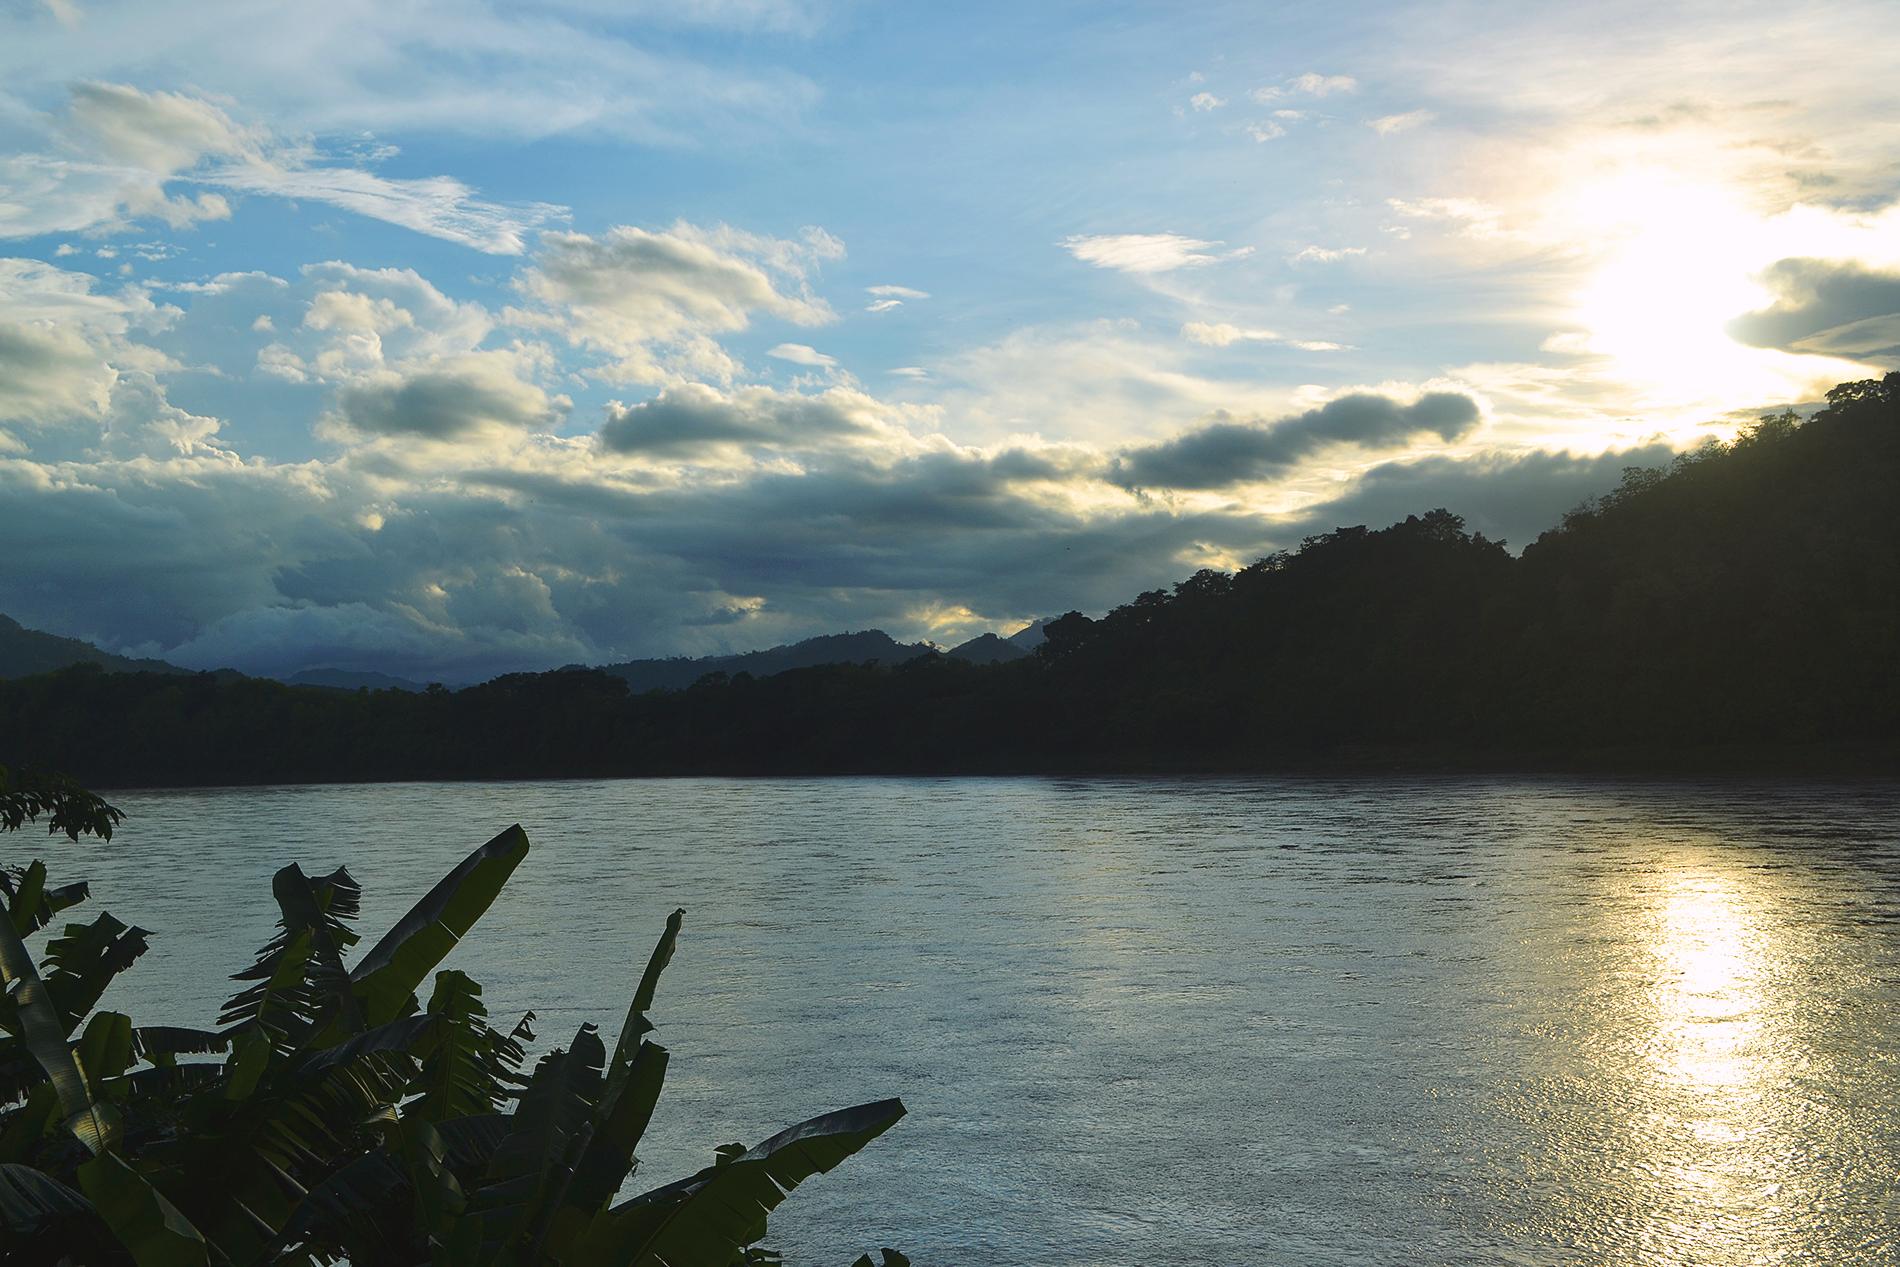 Sunset en el Mekong.